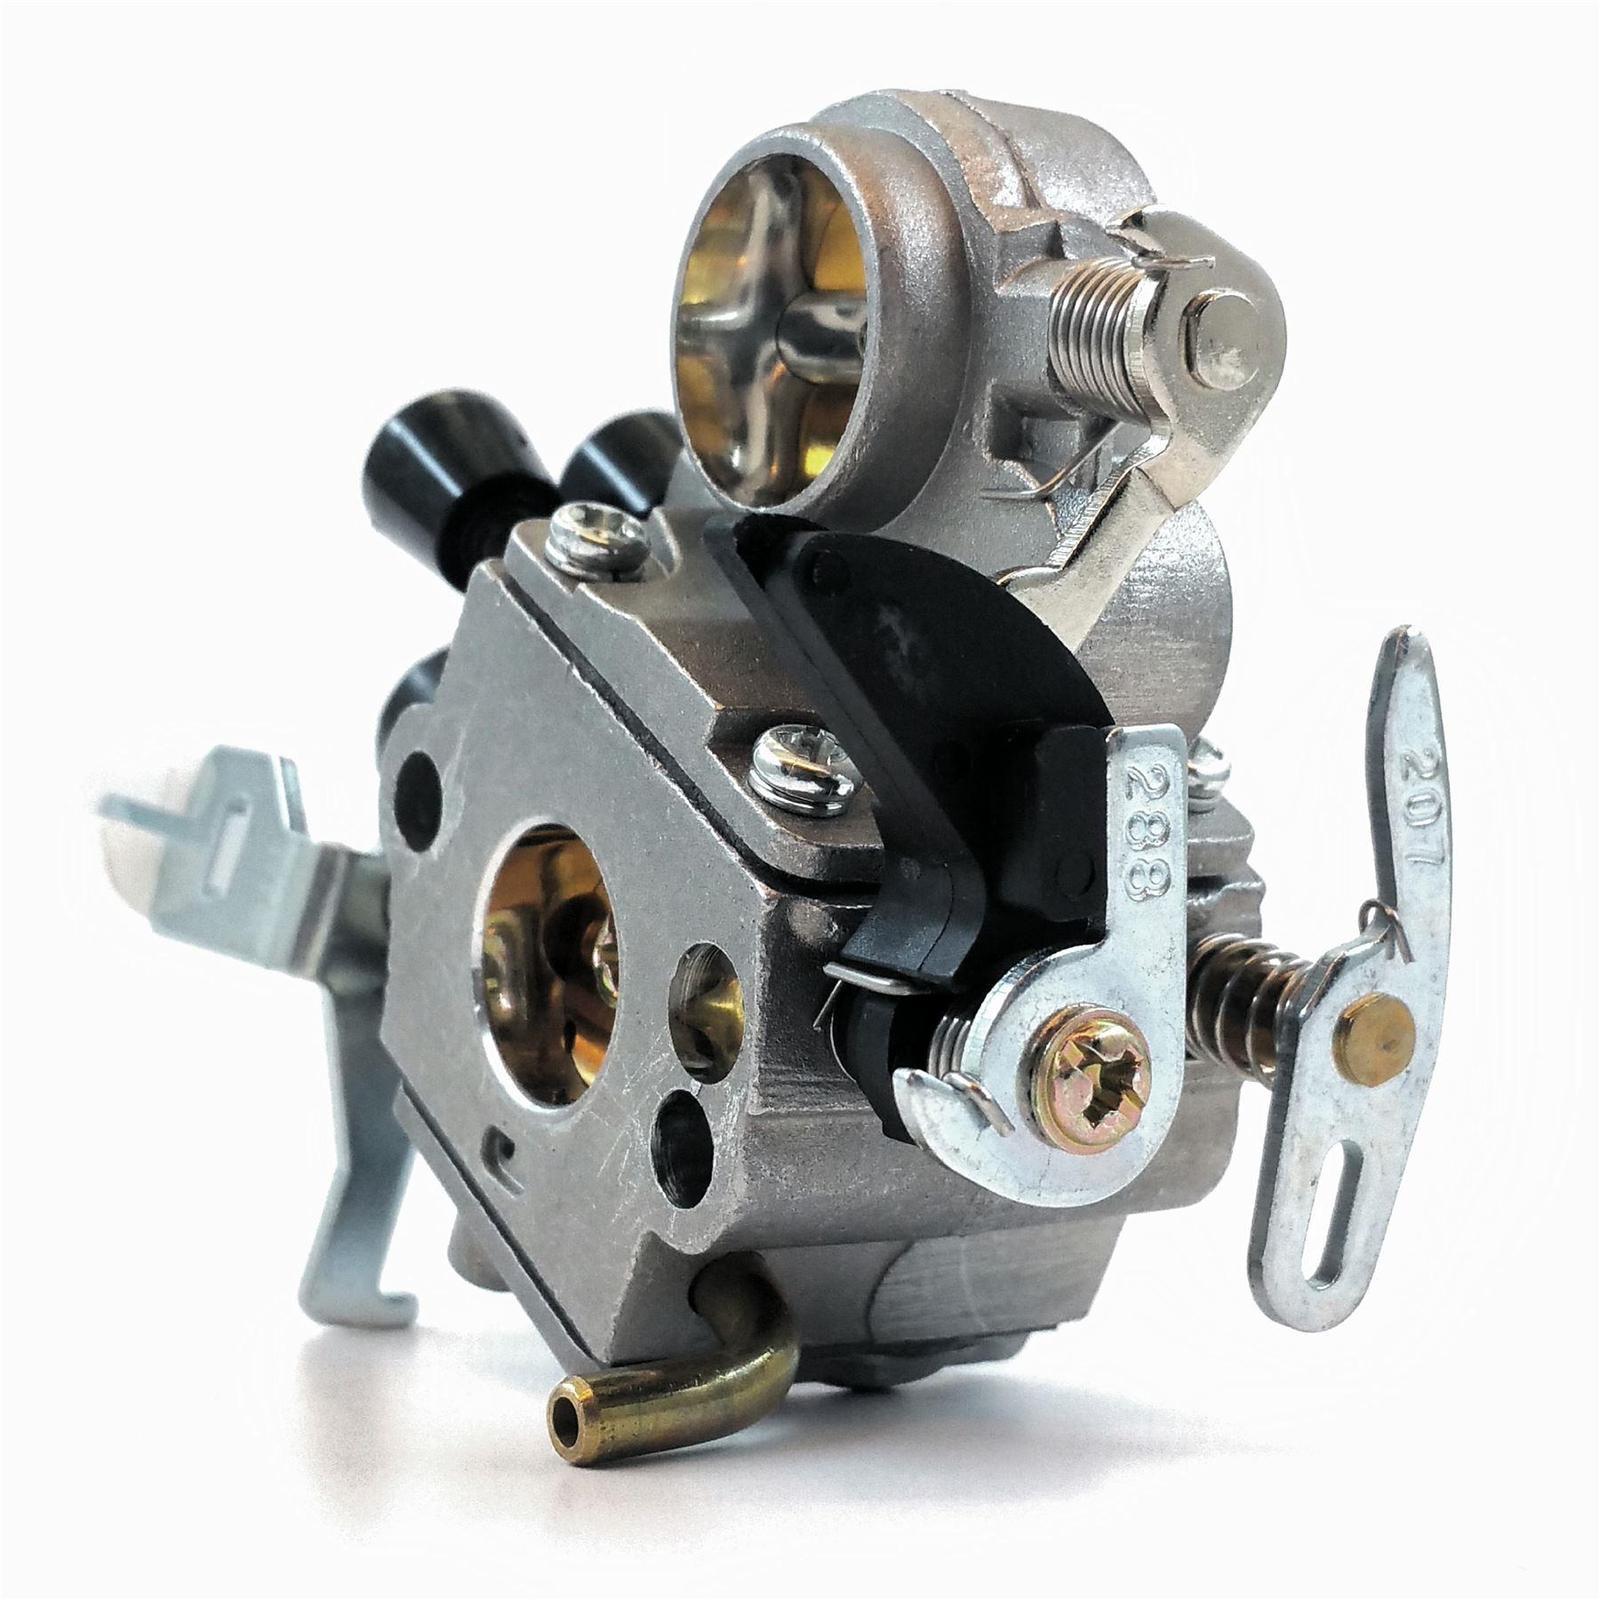 Carburetor for Stihl MS171, MS181, MS211 1139 120 0619